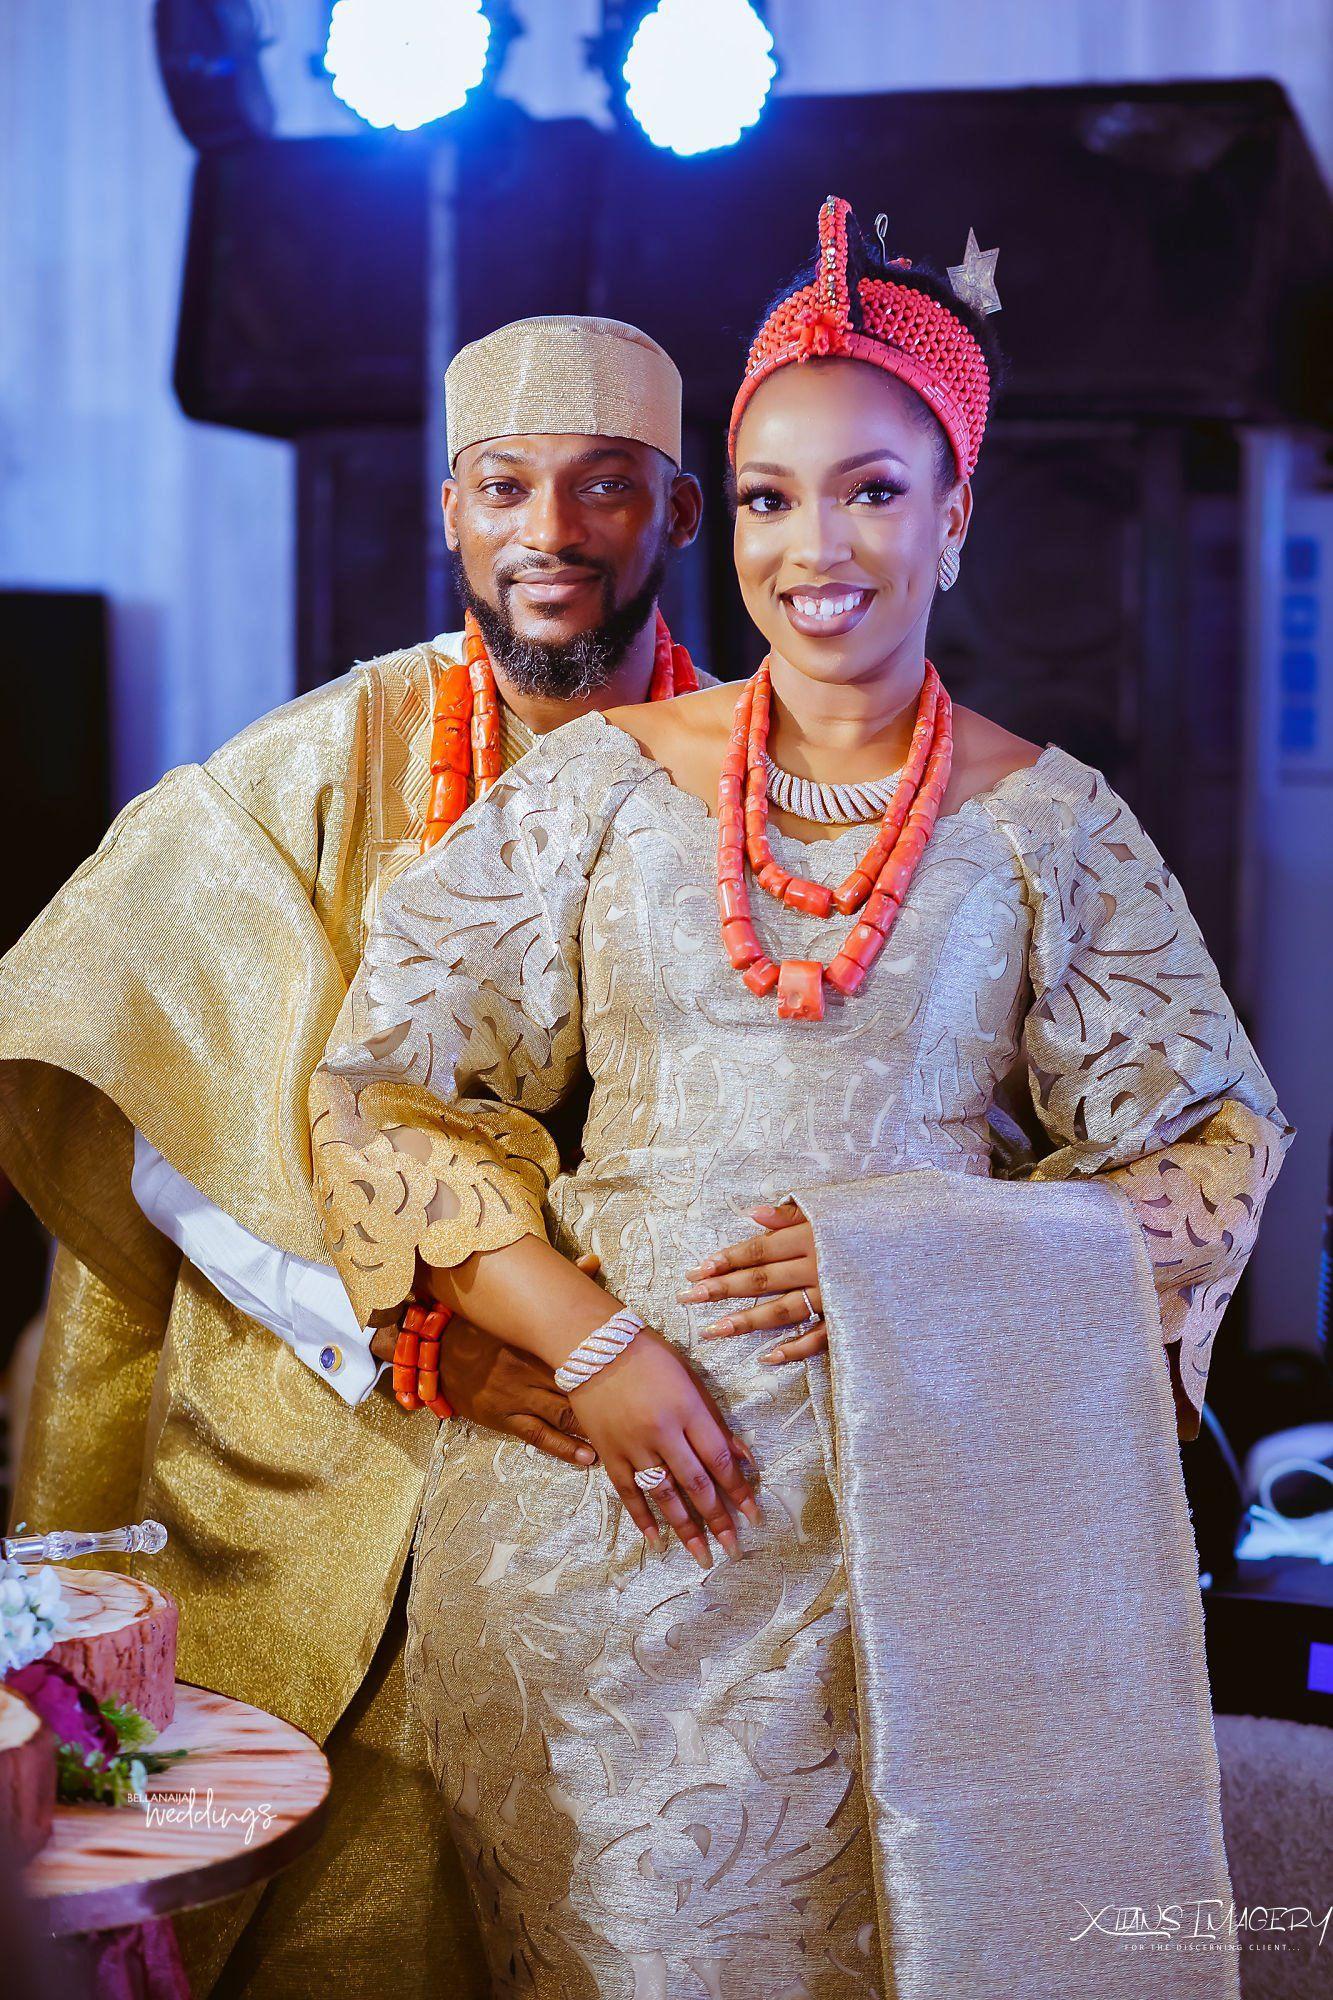 Nigerian Dresses For Nigerian Brides, Benin City, Yoruba people